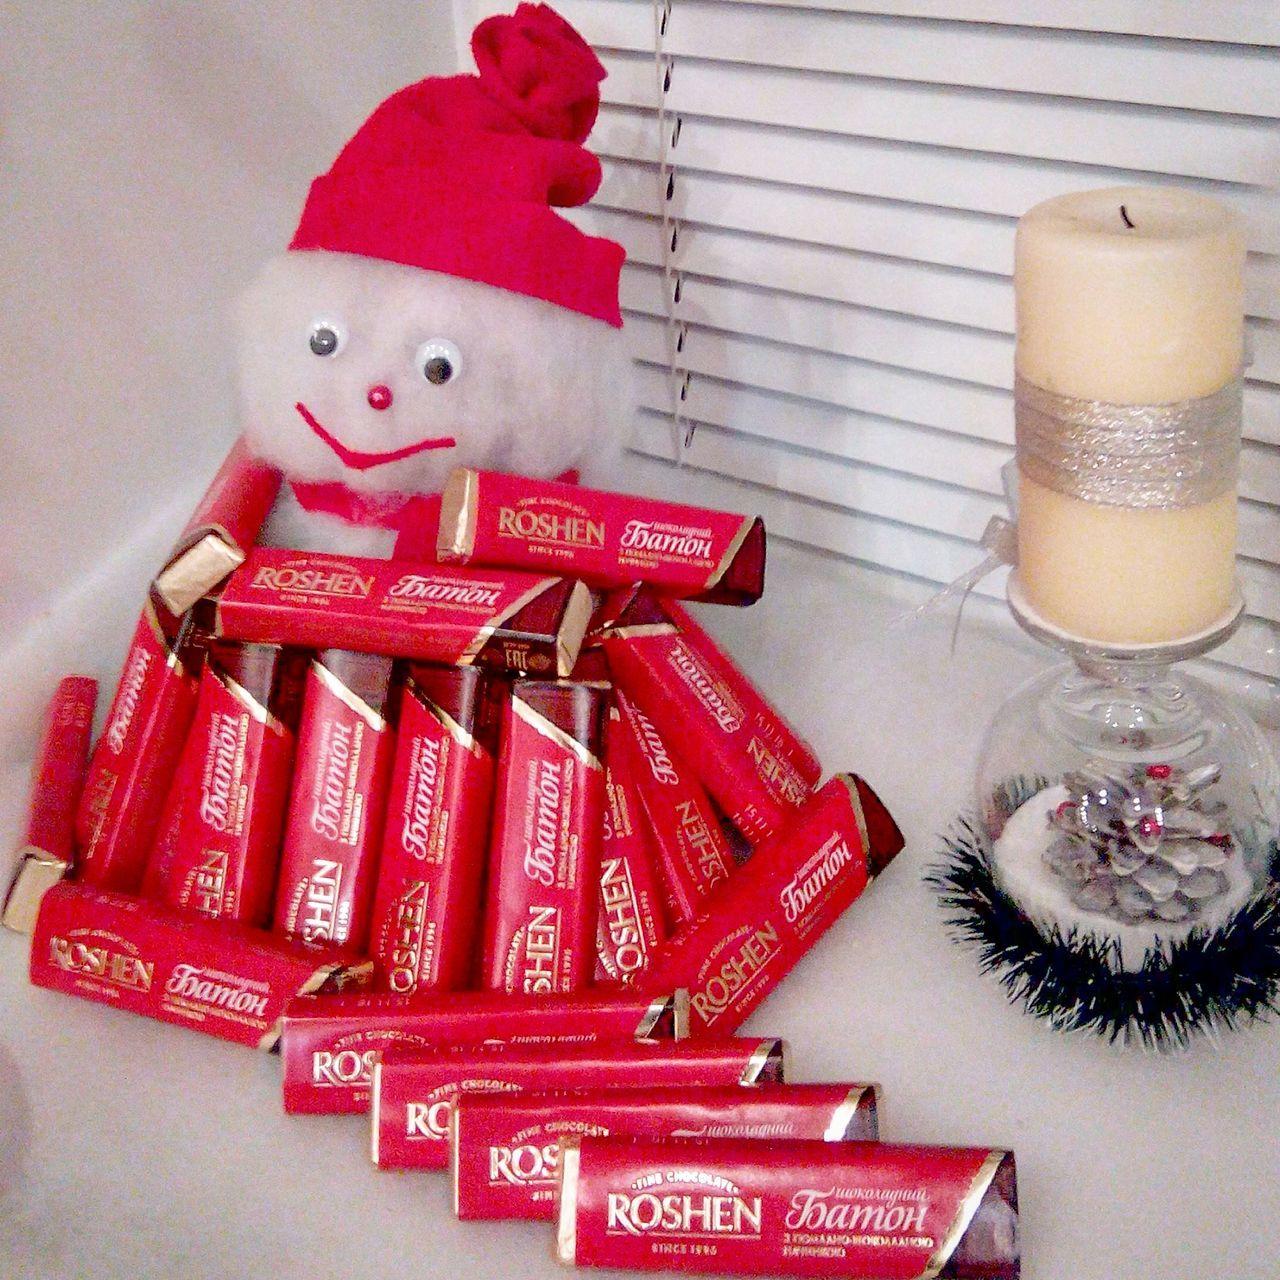 Roshen Chocolate♡ Sweets Snowman⛄ Happytime Good Times Happy Yammmm😋 Ukraine Yammy!!  Ilikethis Goodfood Goodmood☀️